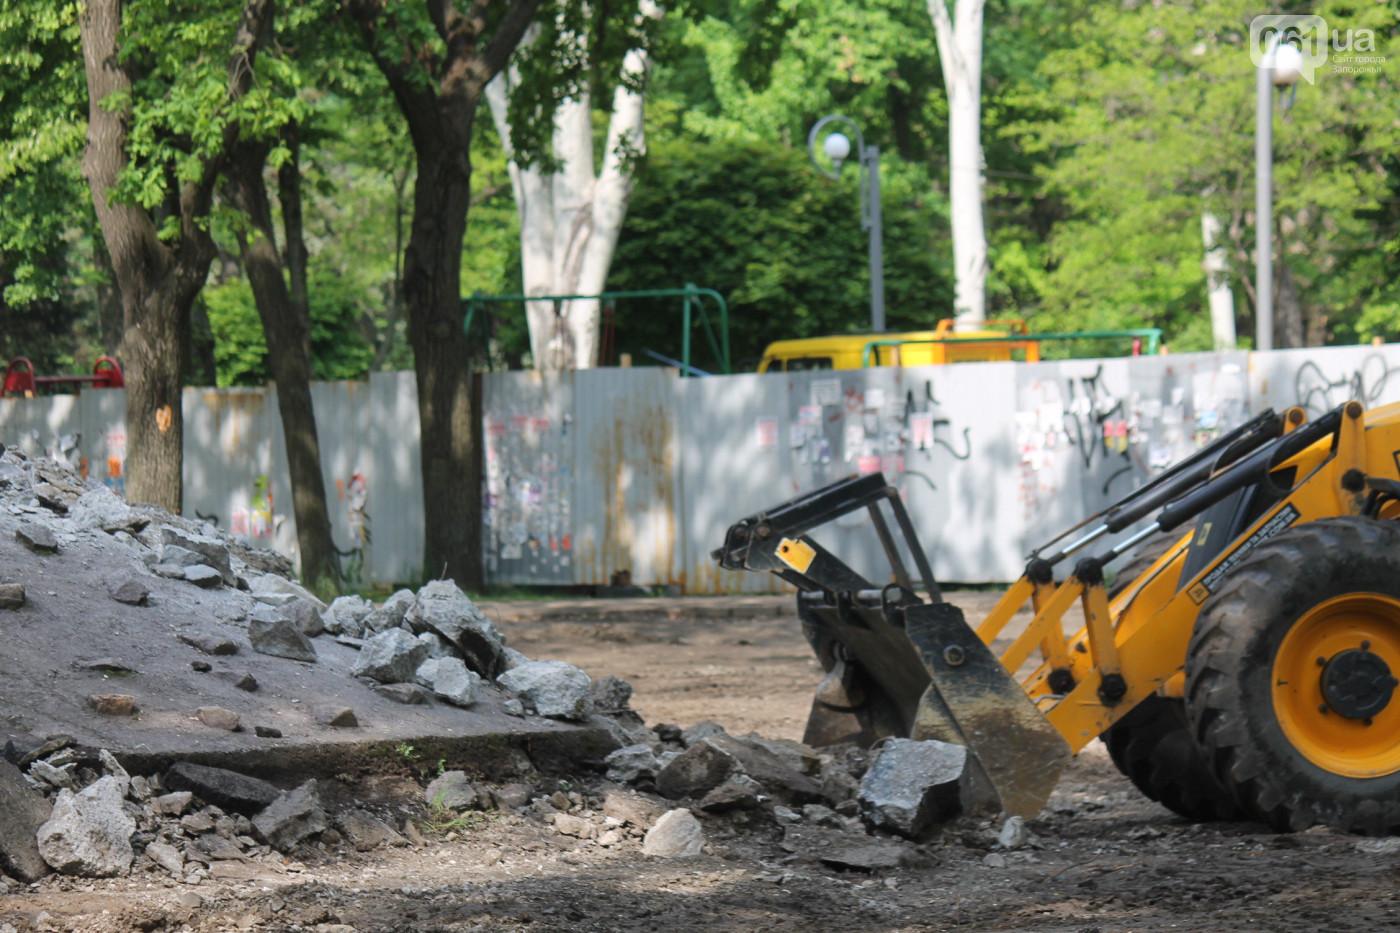 На Кичкасе кипят работы по реконструкции сквера за 16 миллионов (Фото)